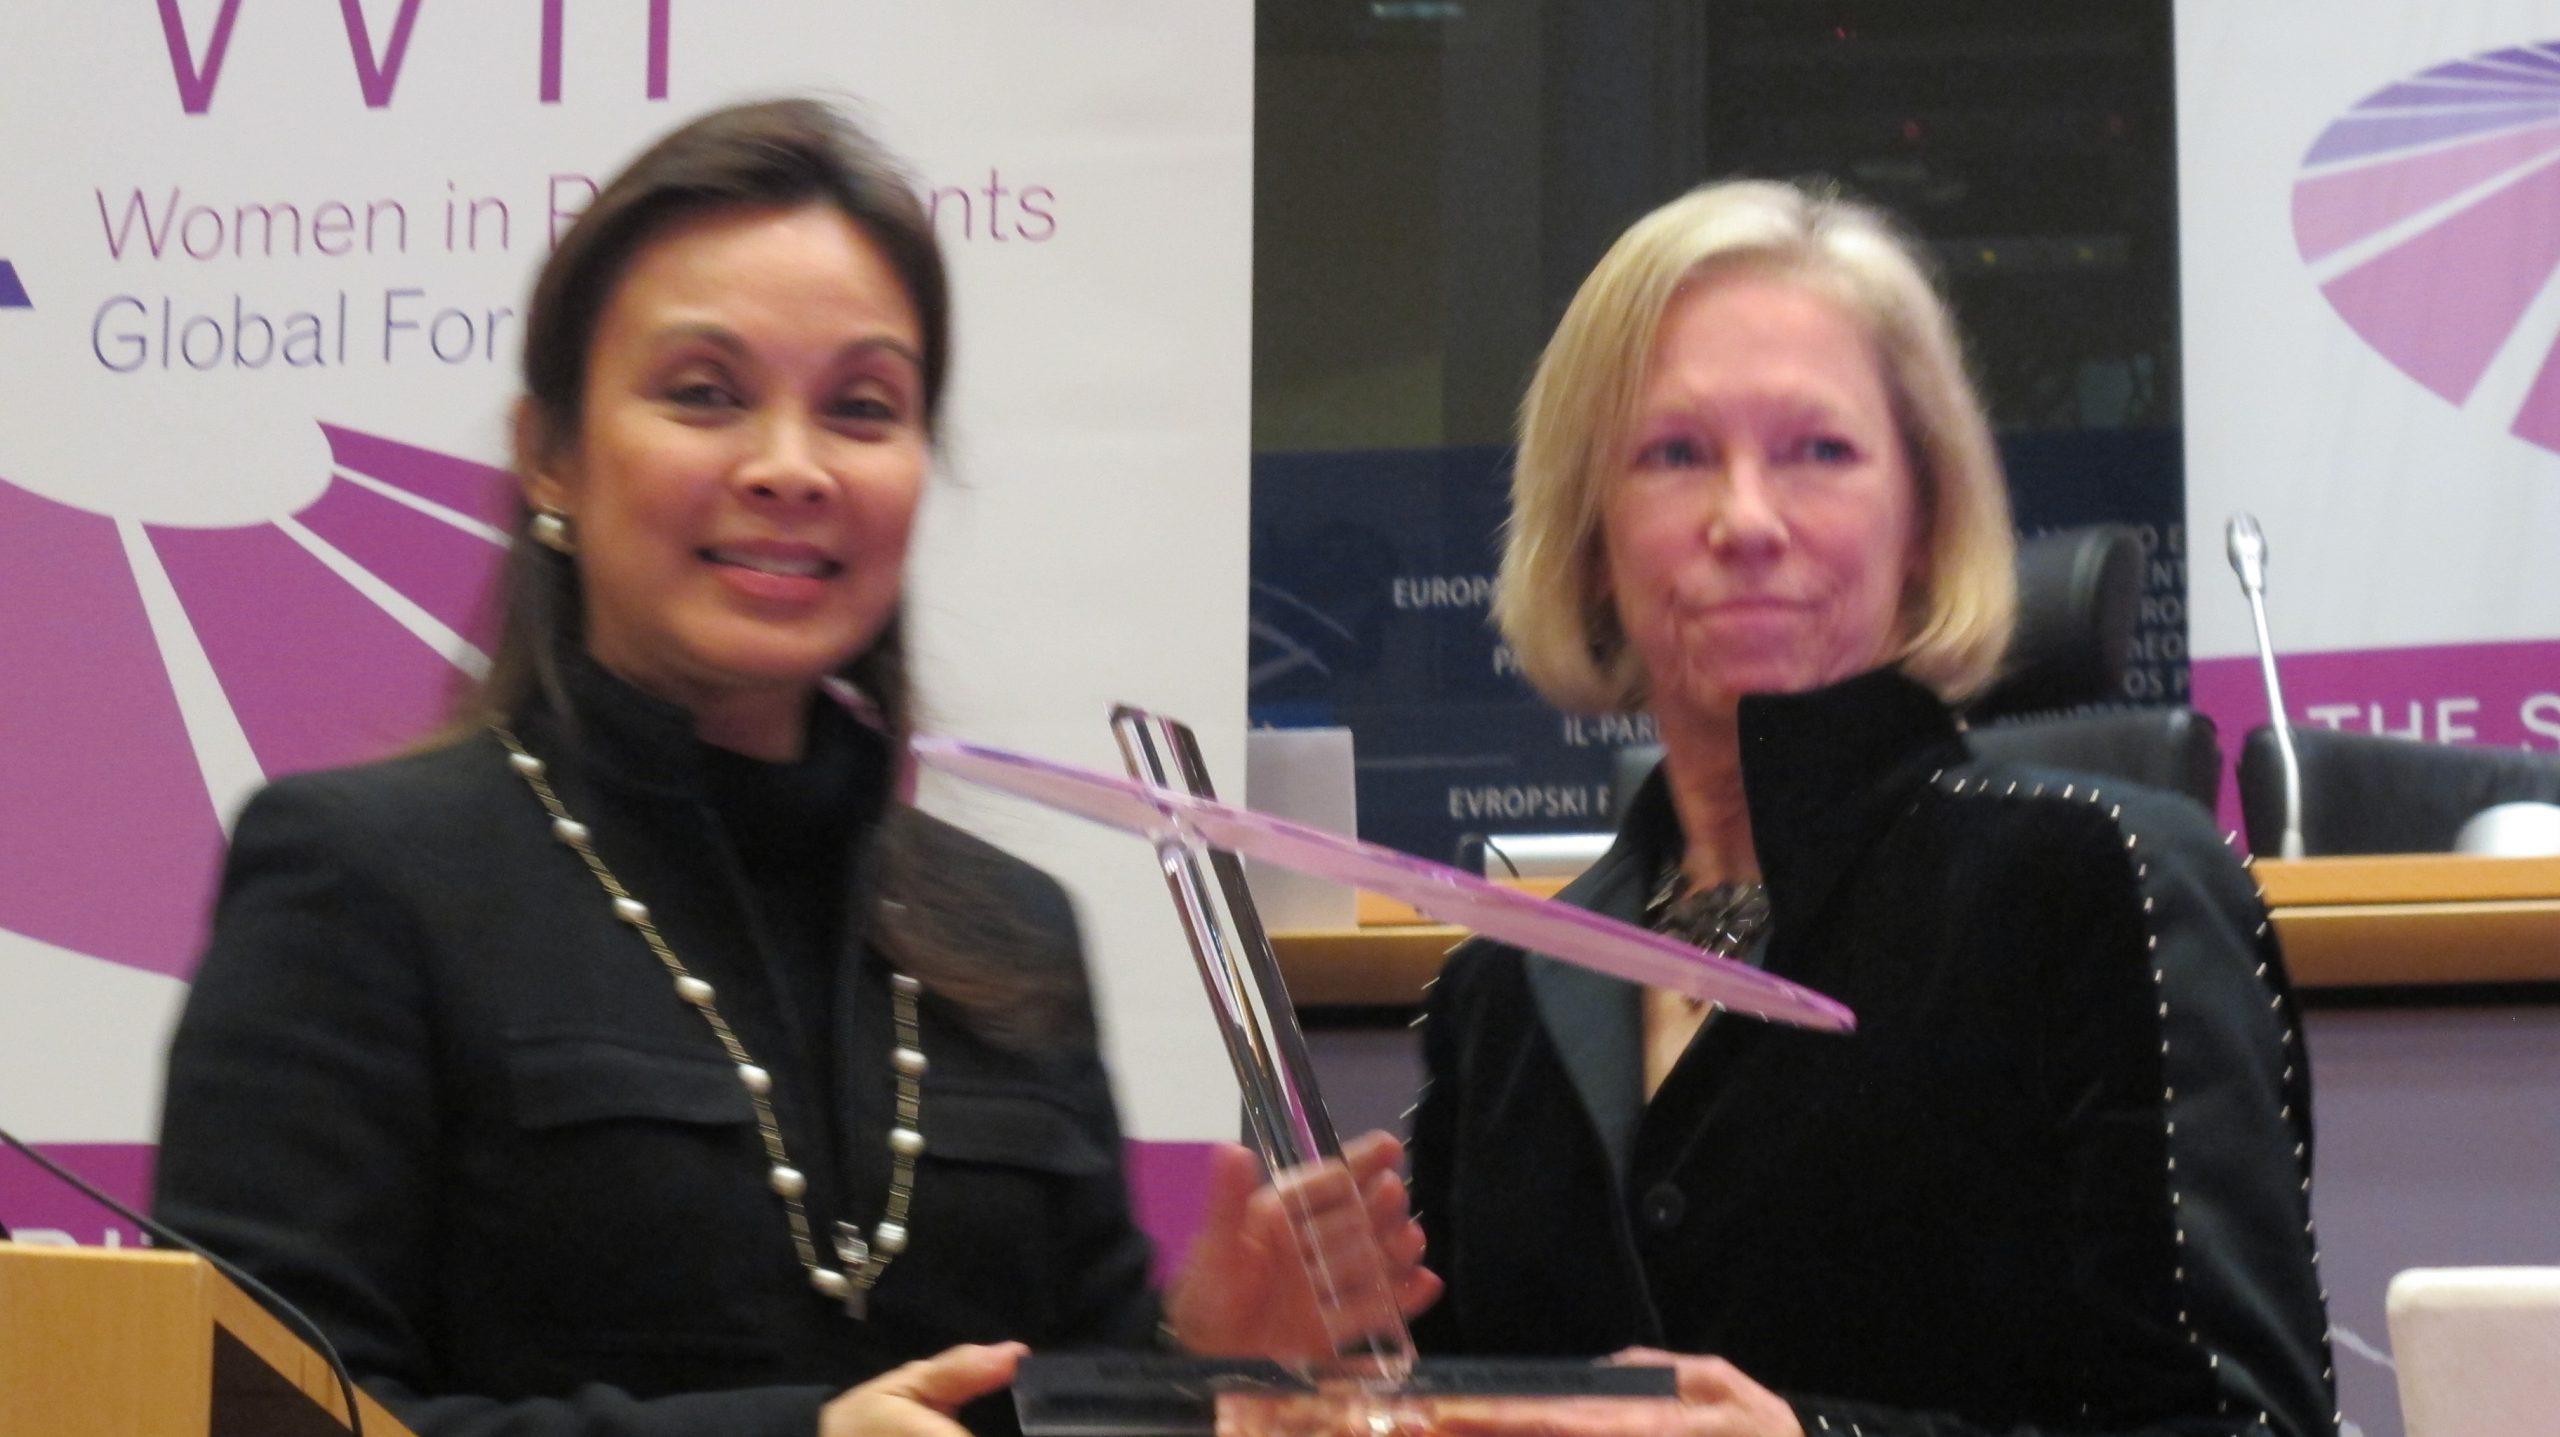 PHL Receives Award on Closing the Gender Gap